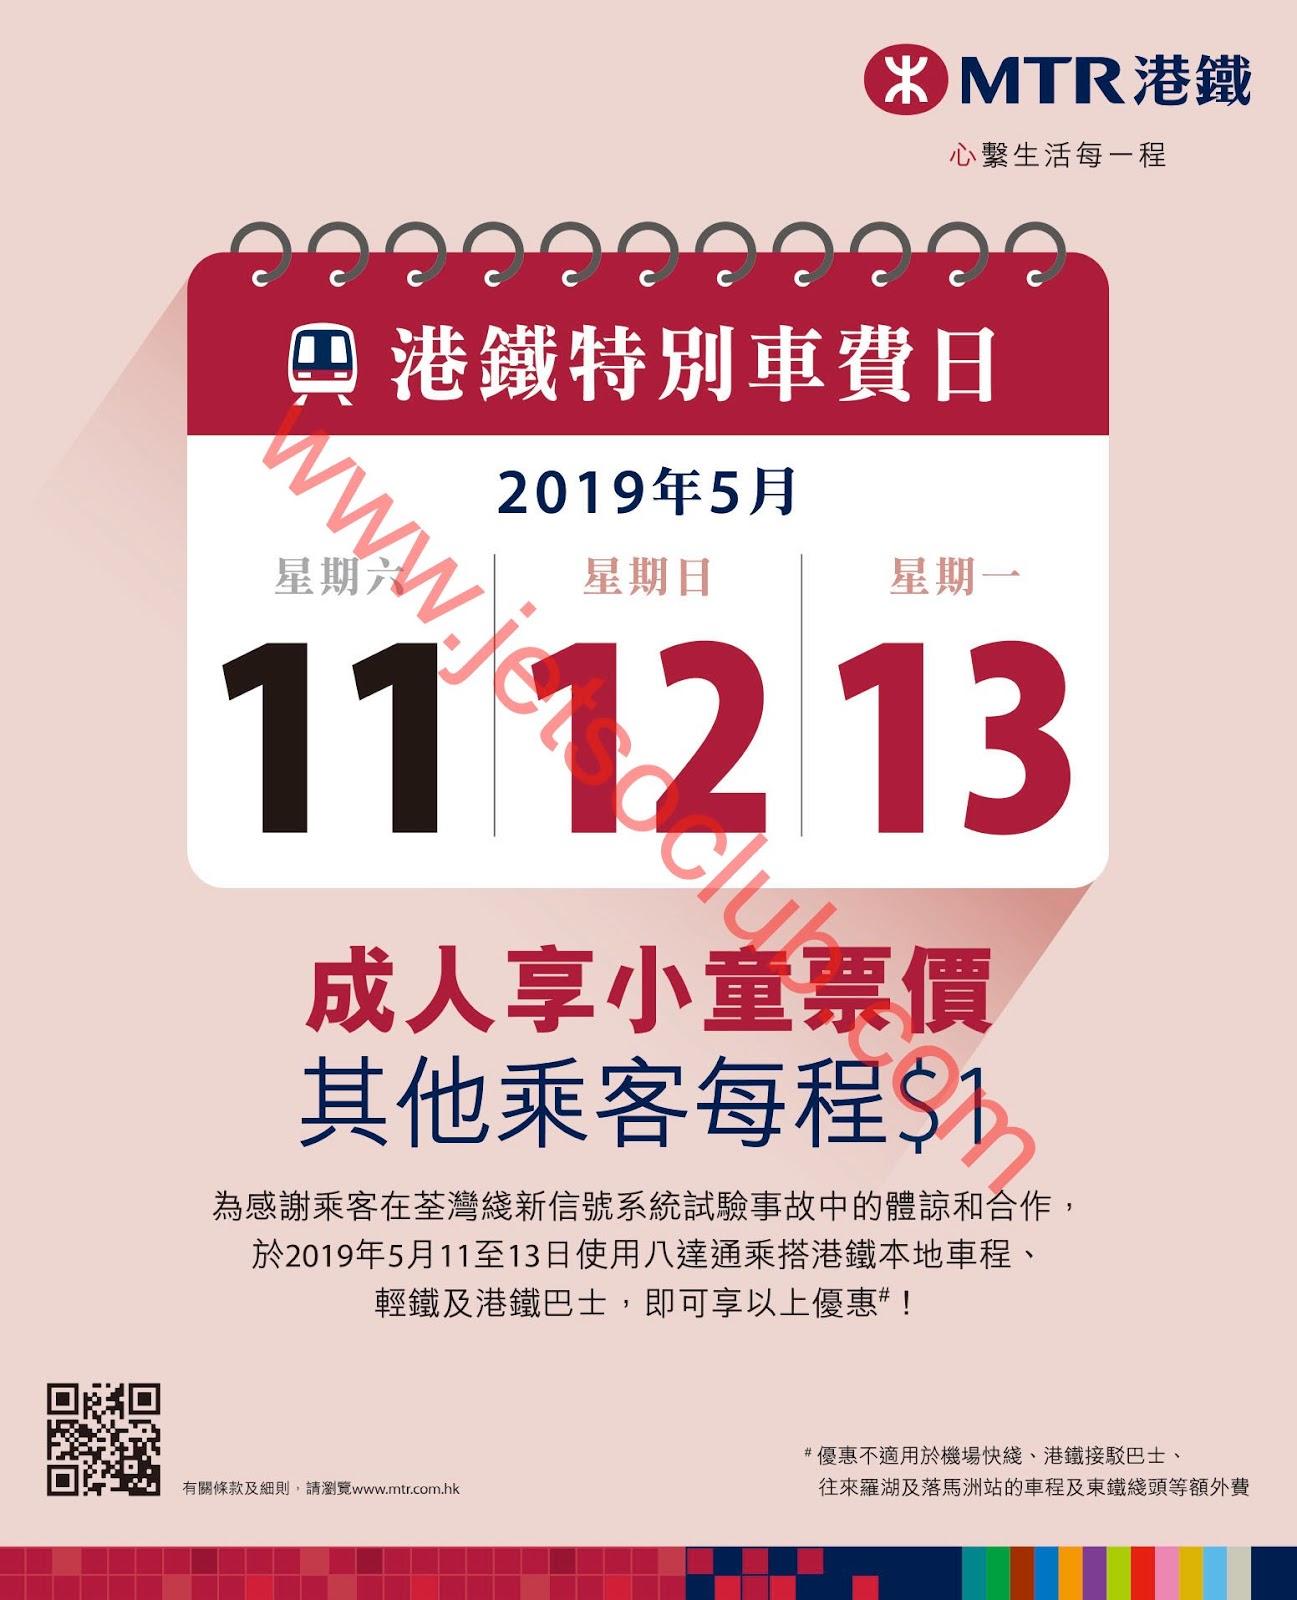 MTR 港鐵:特別車費日 成人享小童票價 / 其他乘客 每程$1(11-13/5) ( Jetso Club 著數俱樂部 )